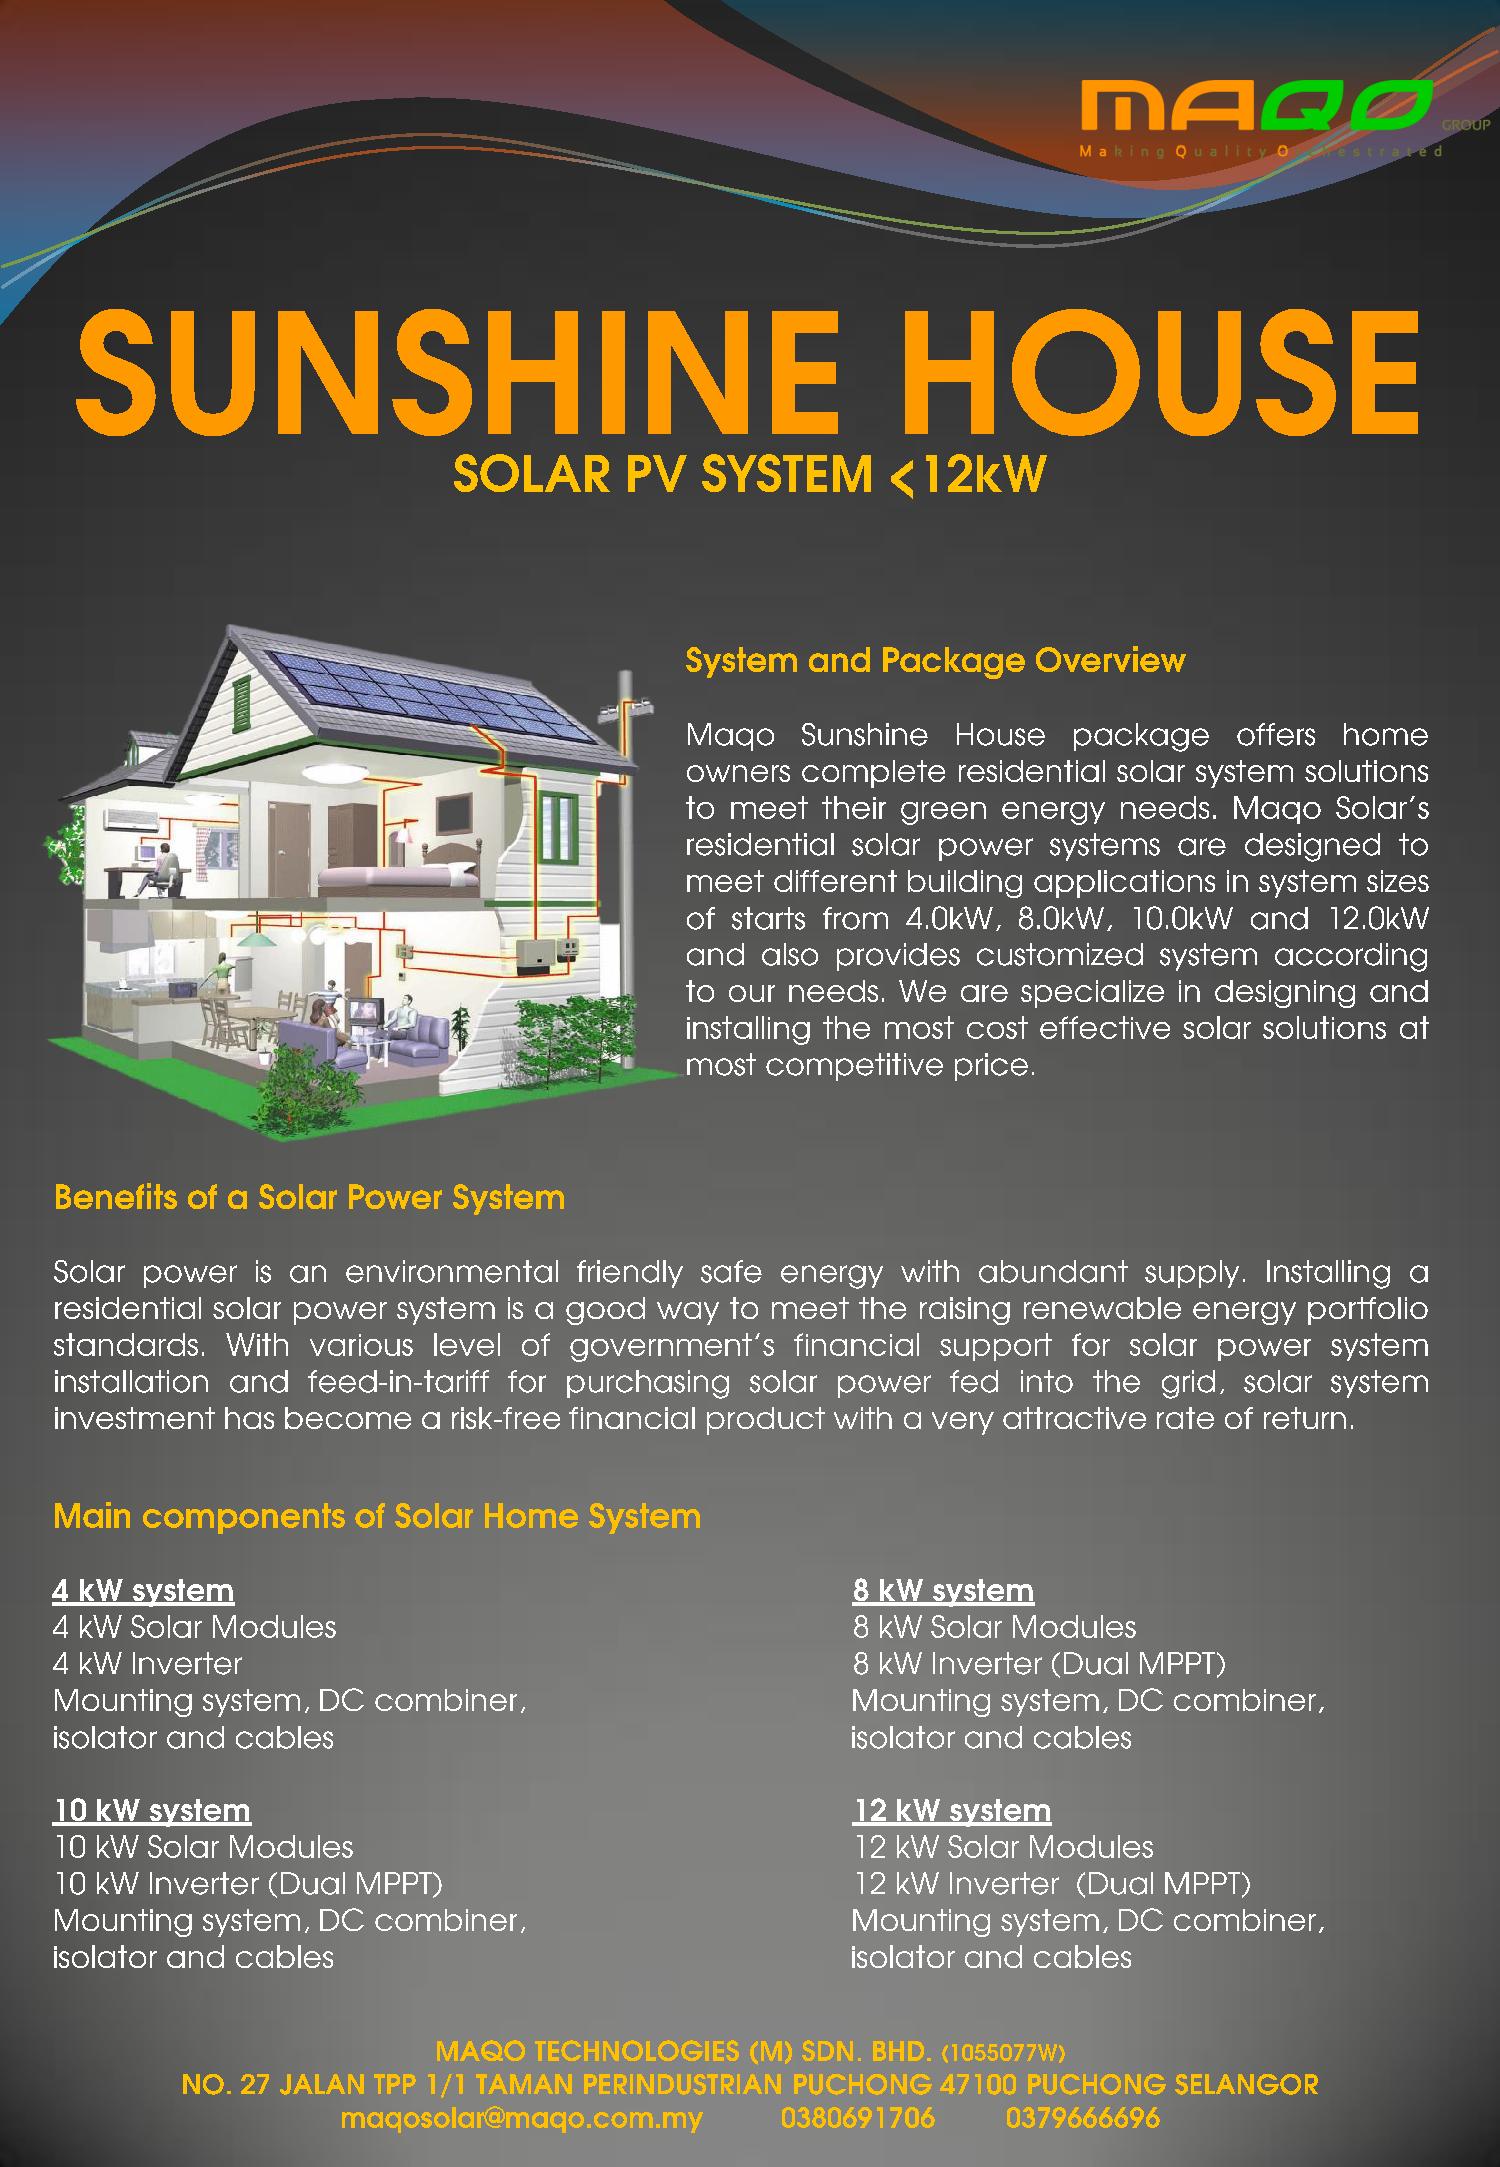 Solar Pv system<12kW Residential